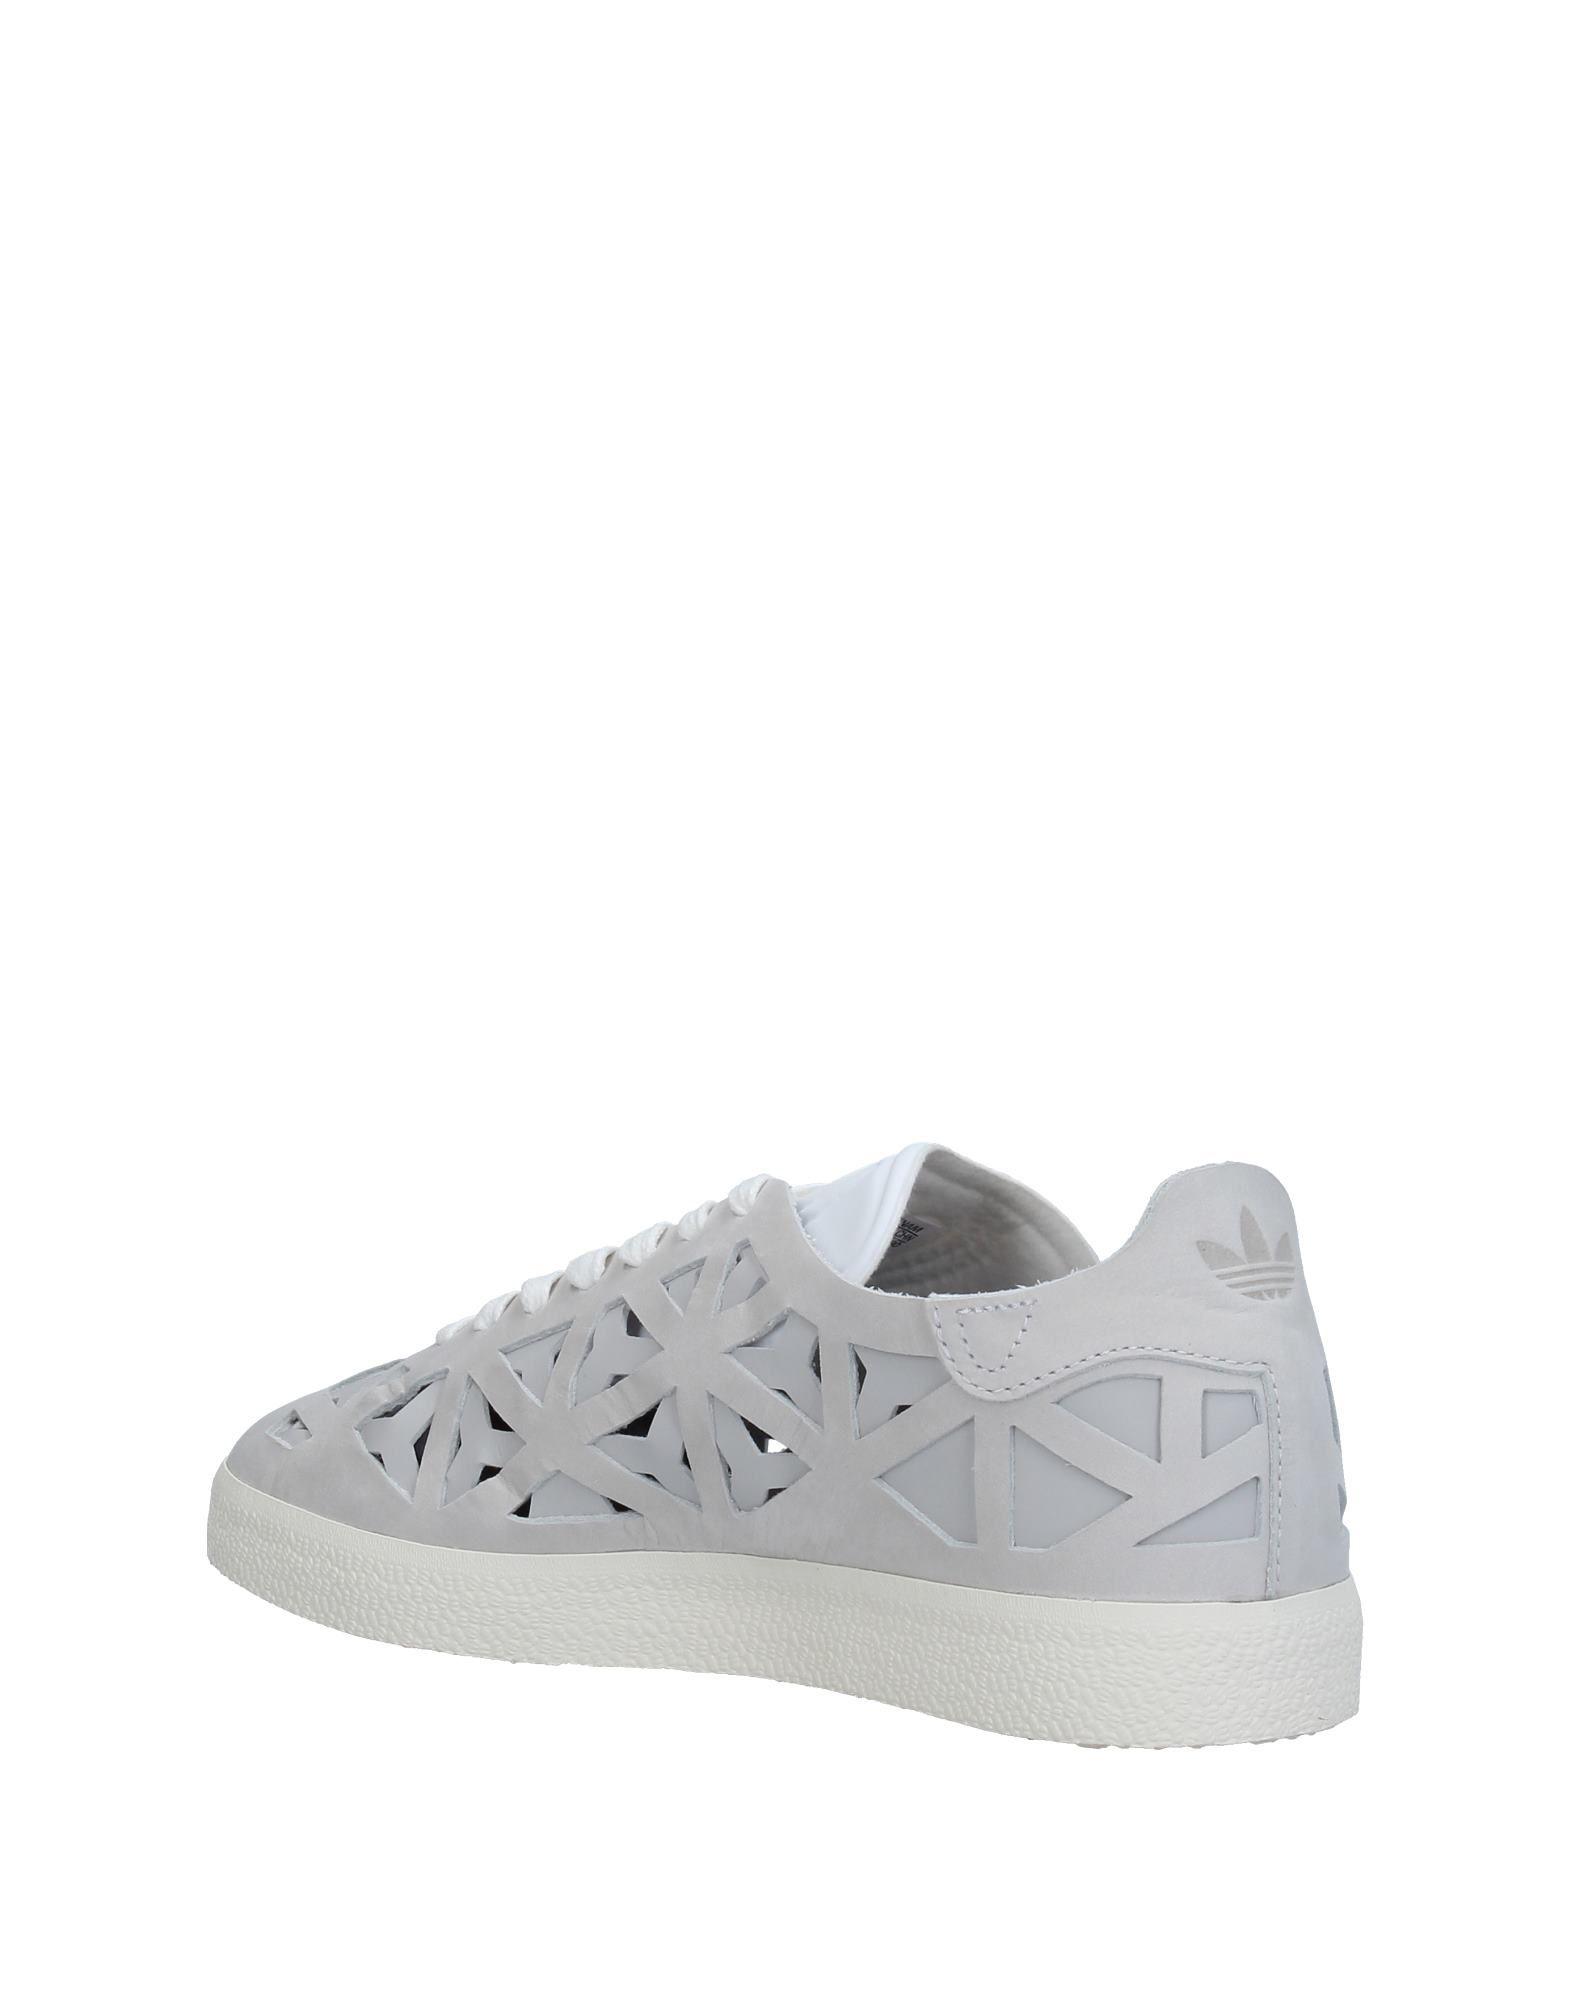 Adidas Originals Sneakers Damen  11335784HJ